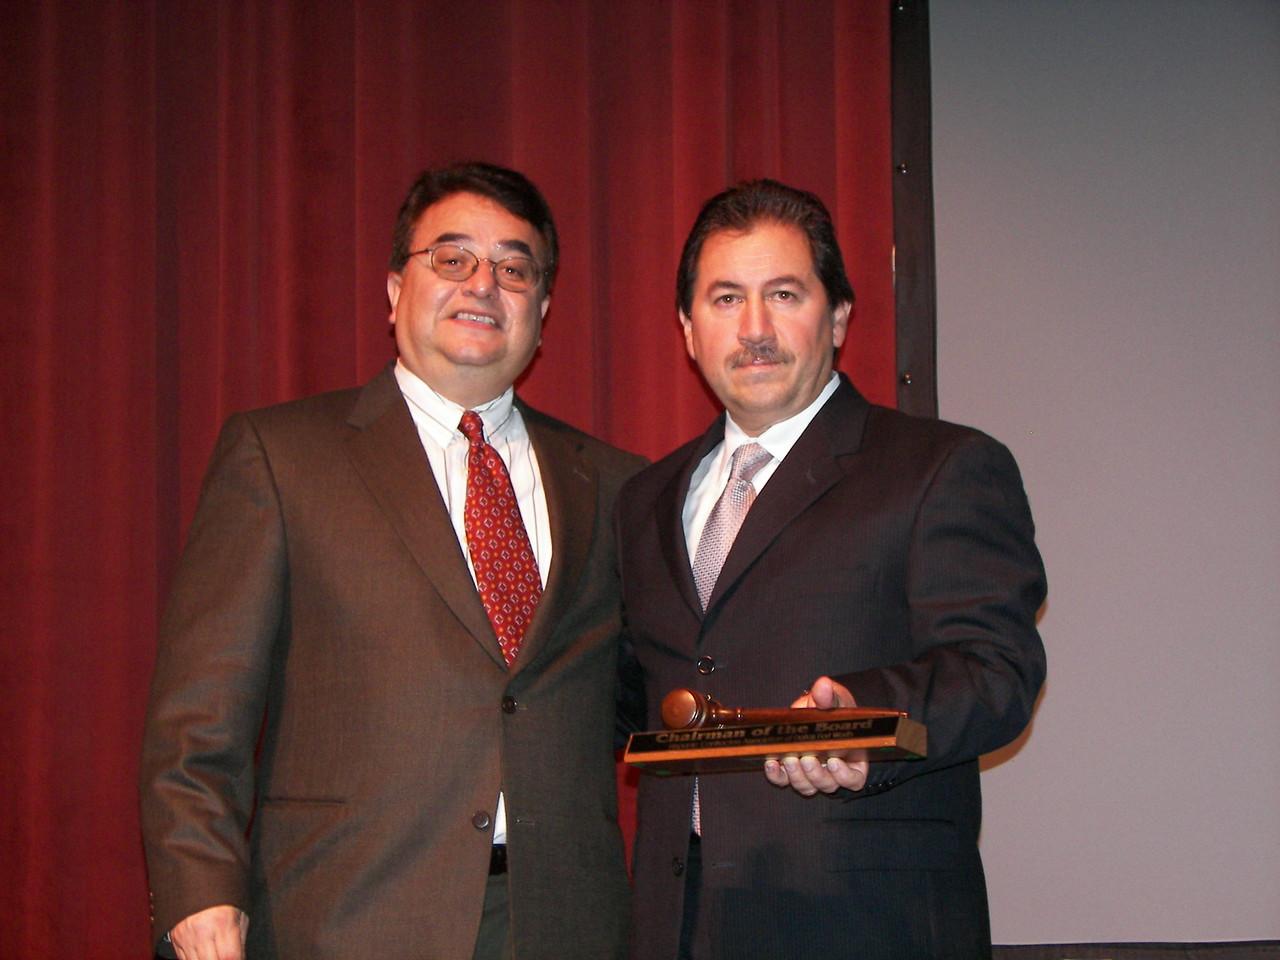 Chris Escobedo presents Luis Spinola with a commemorative gavel.